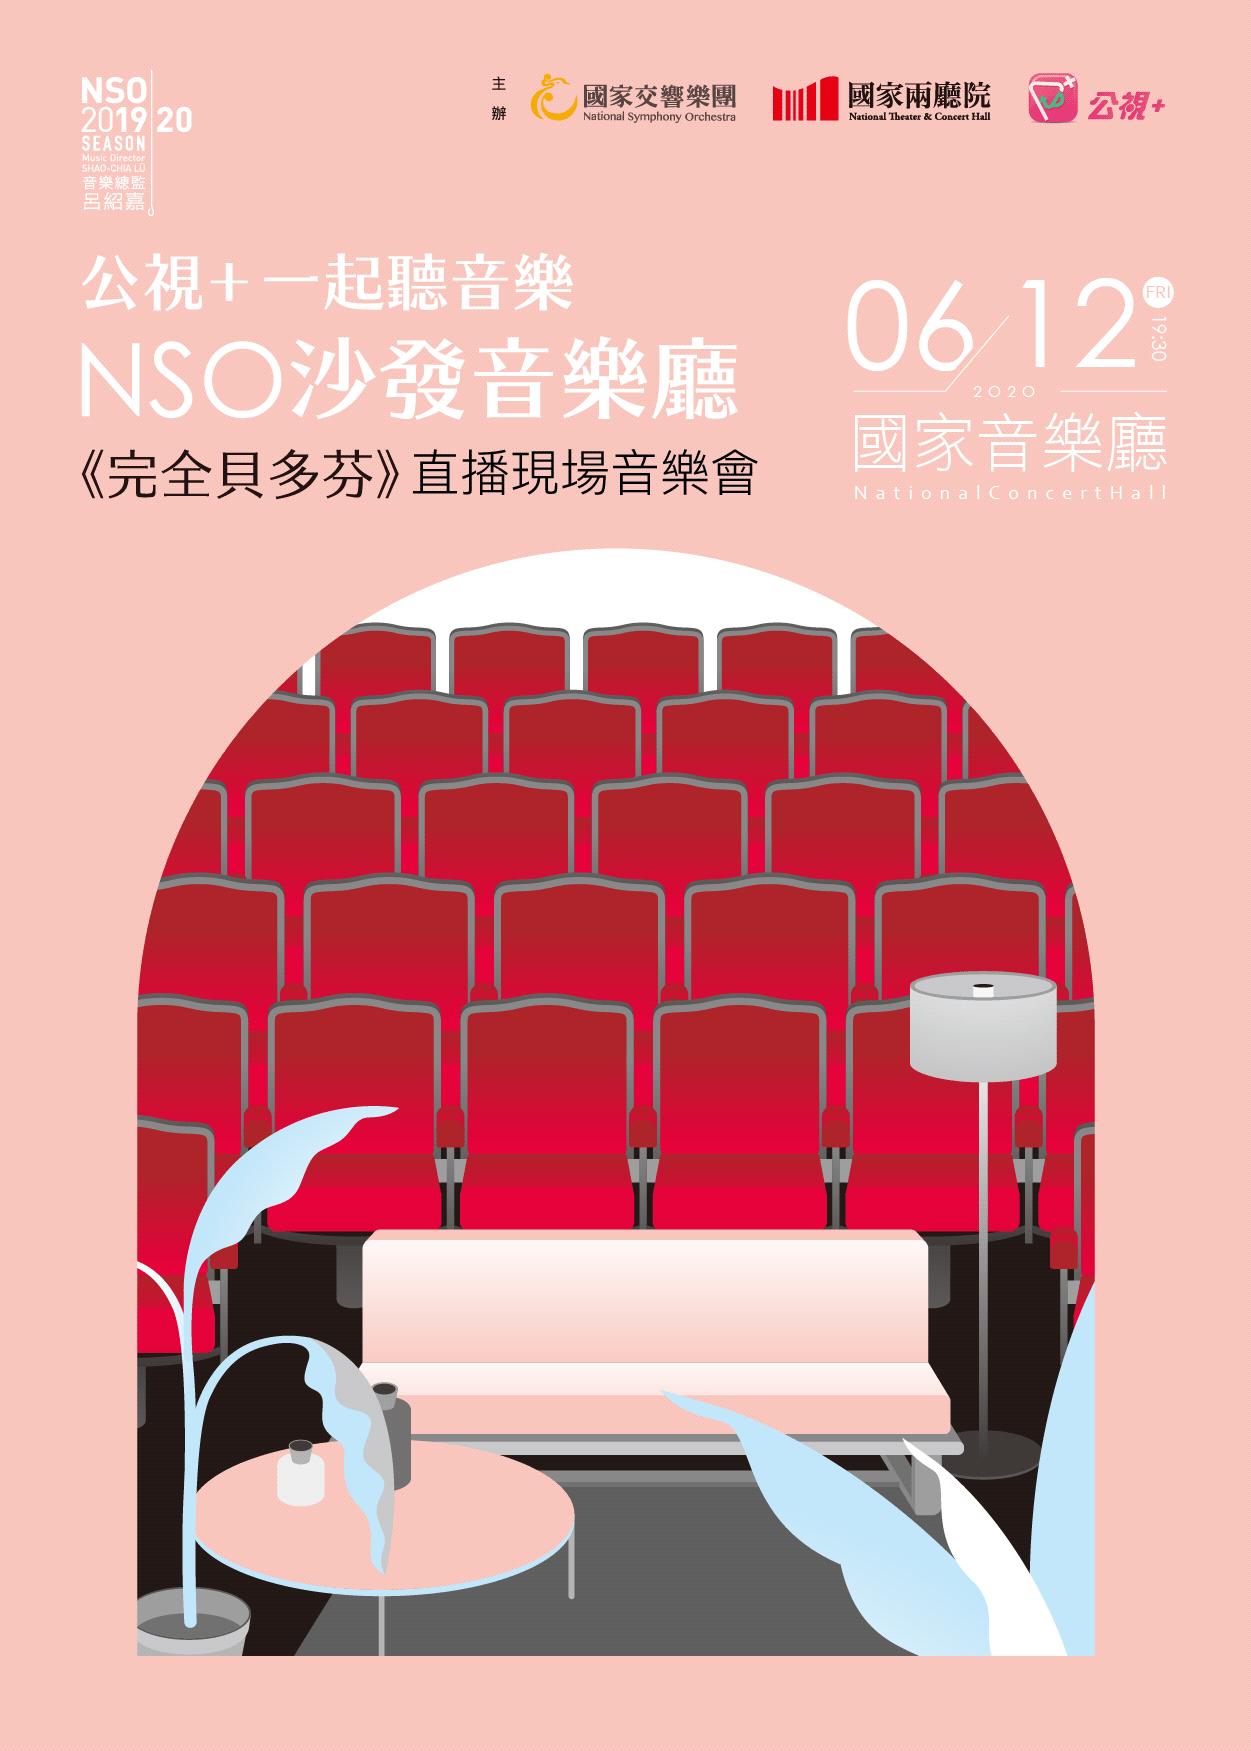 NSO《完全貝多芬》直播現場音樂會